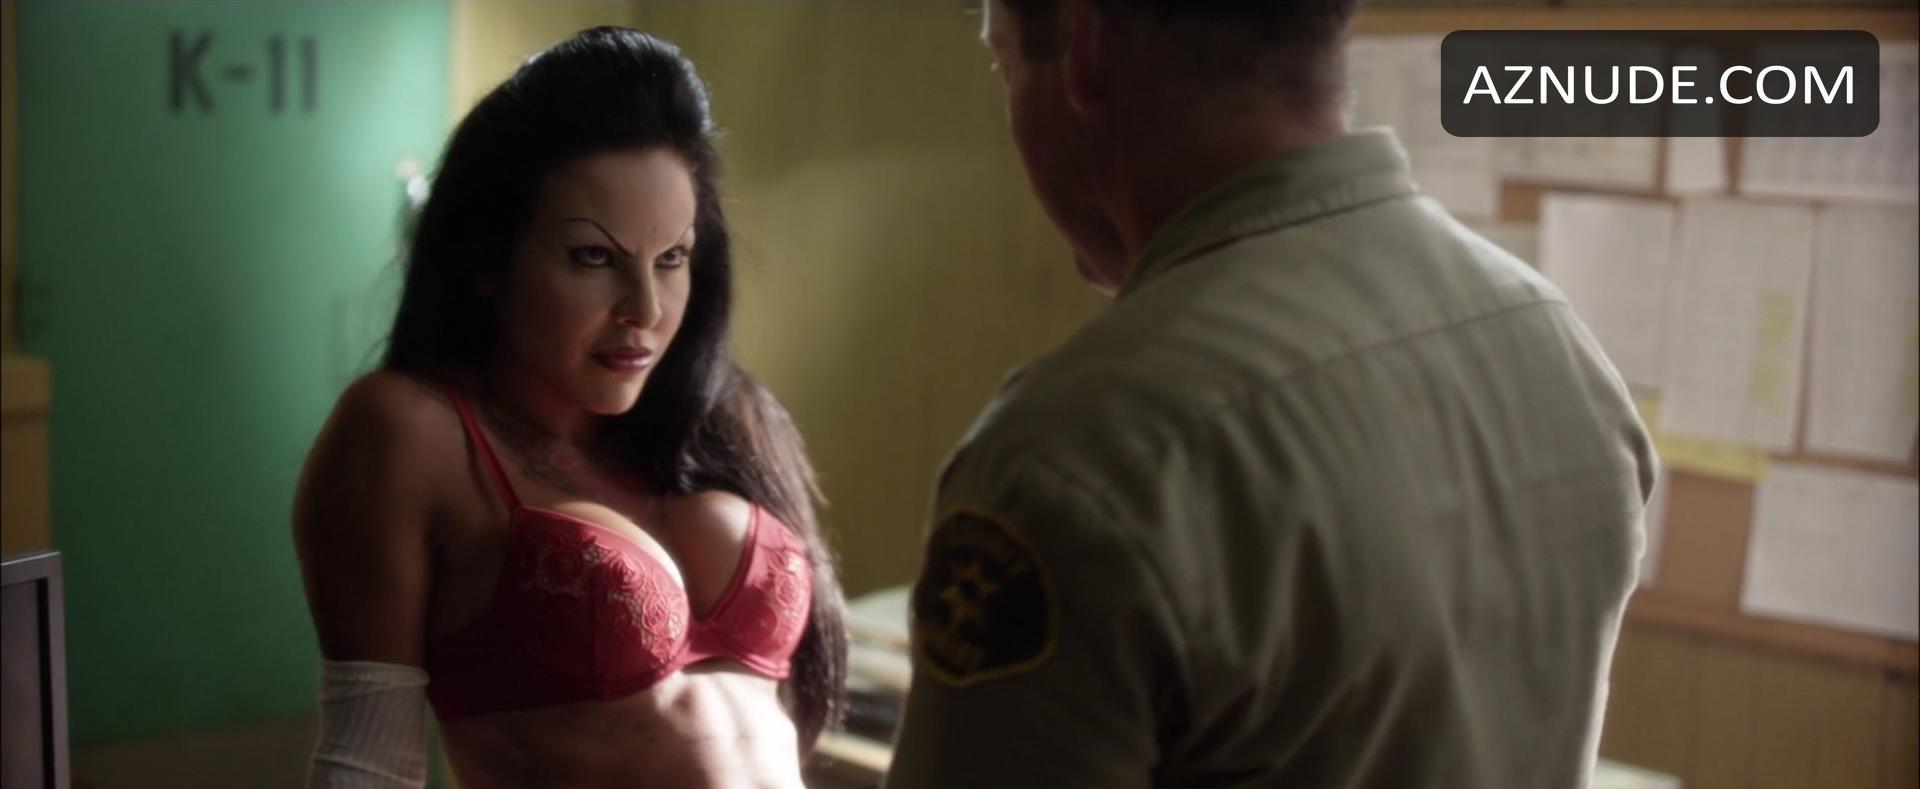 Kate del castillo sex scene